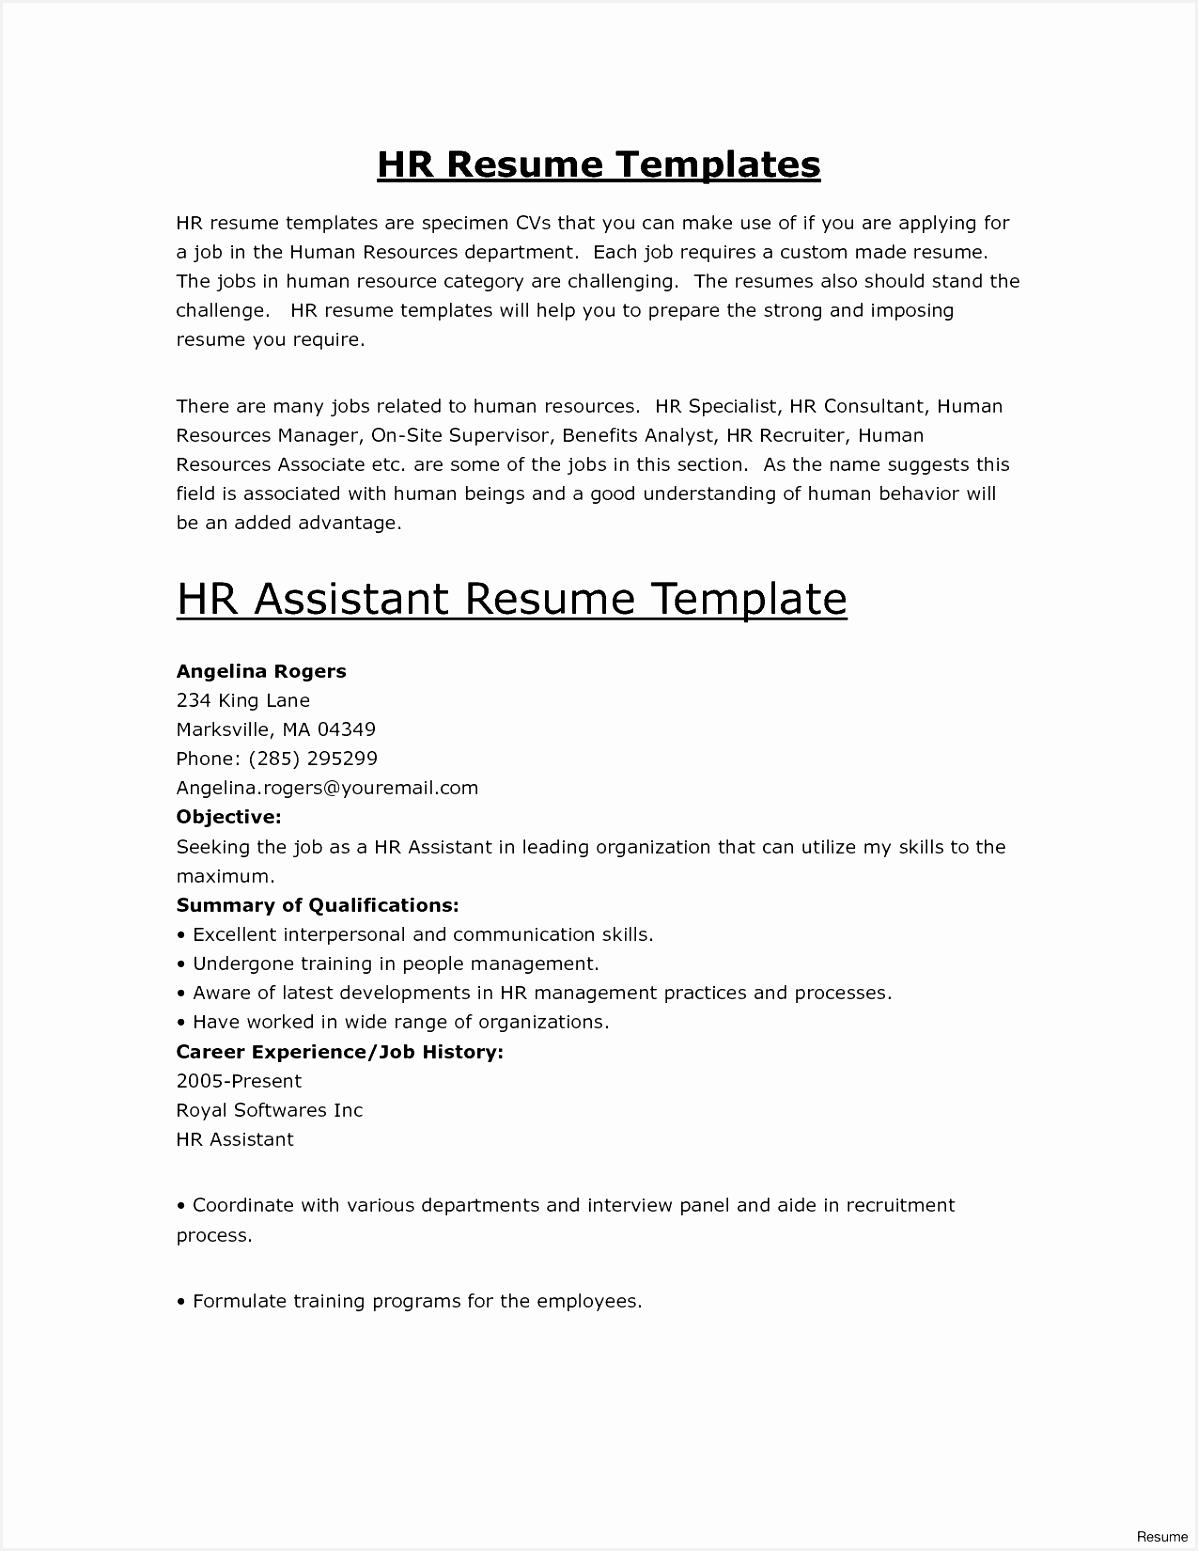 Cv Templates Download Exddg New Free Cover Letter Downloads New Programmer Resume Lovely Resume Of 5 Cv Templates Download